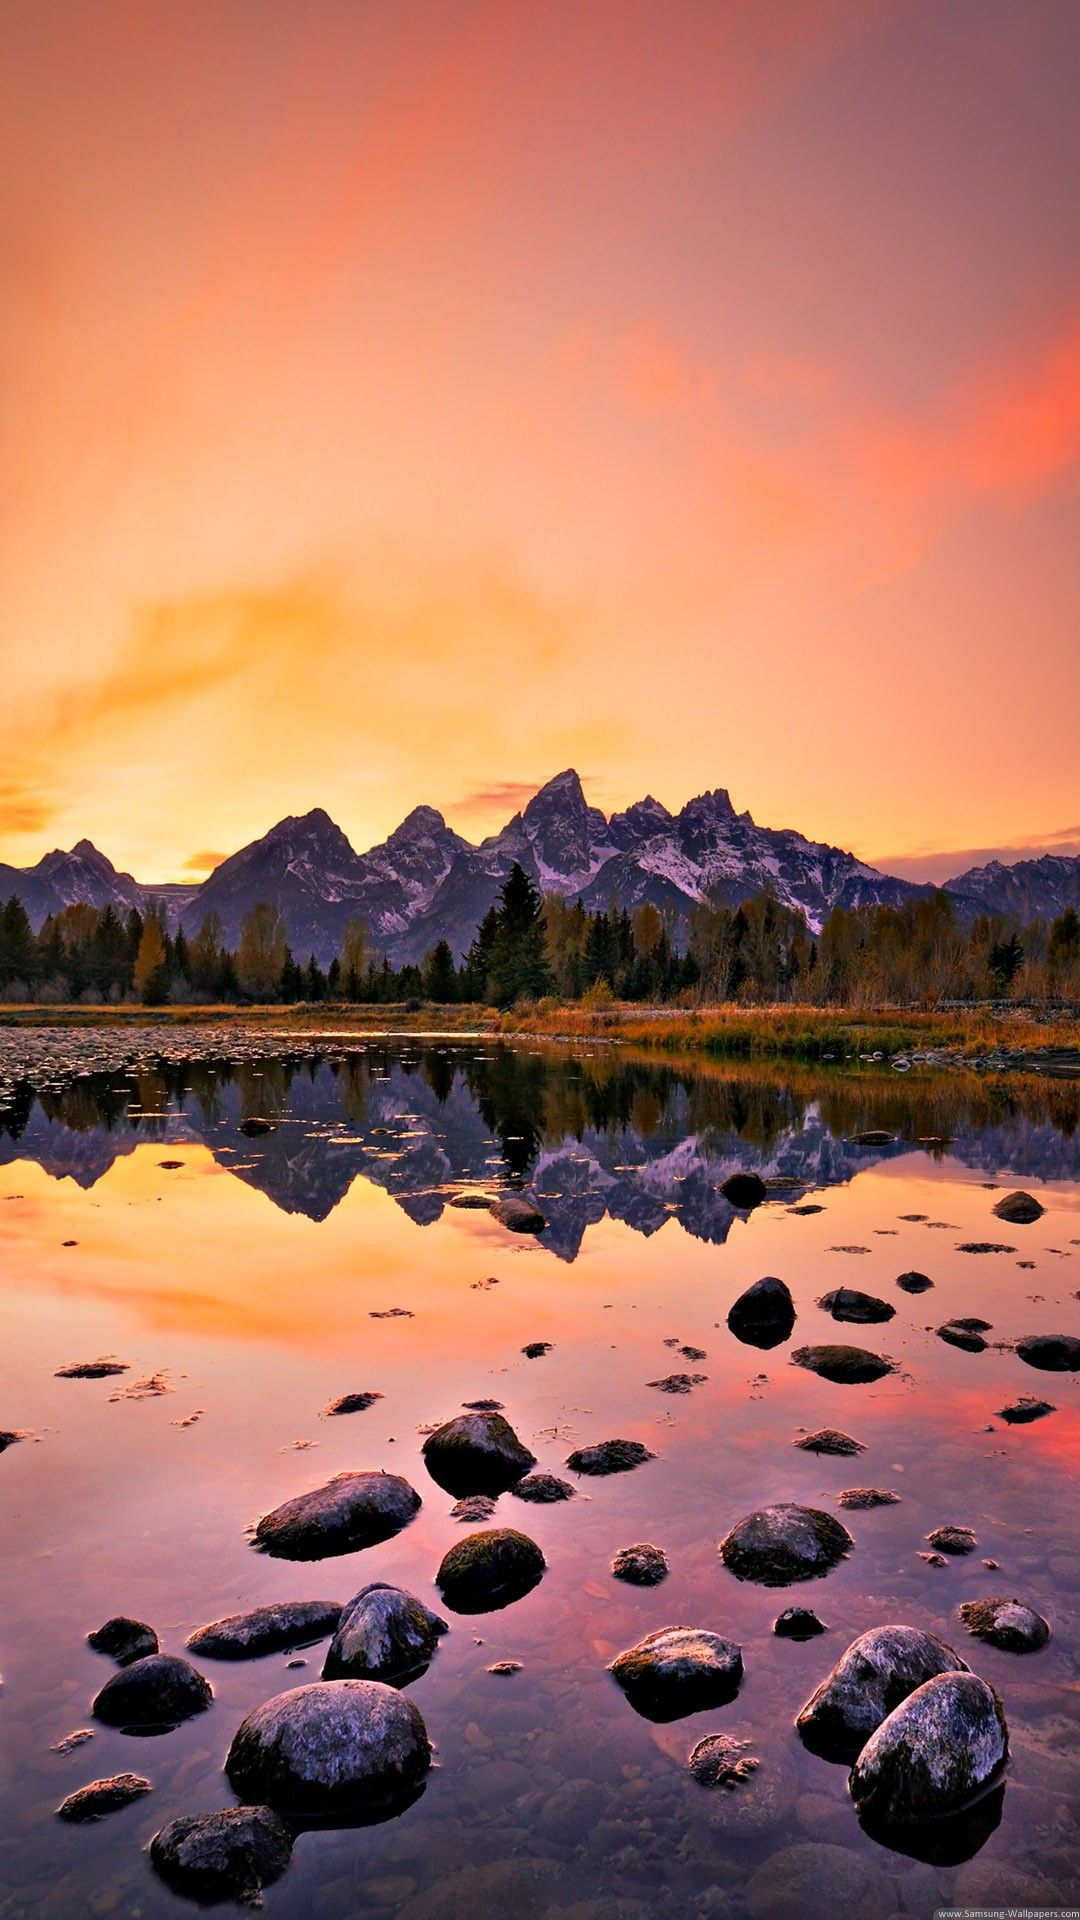 Mountain Lake Sunset Android Wallpaper Hd Iphone Wallpaper